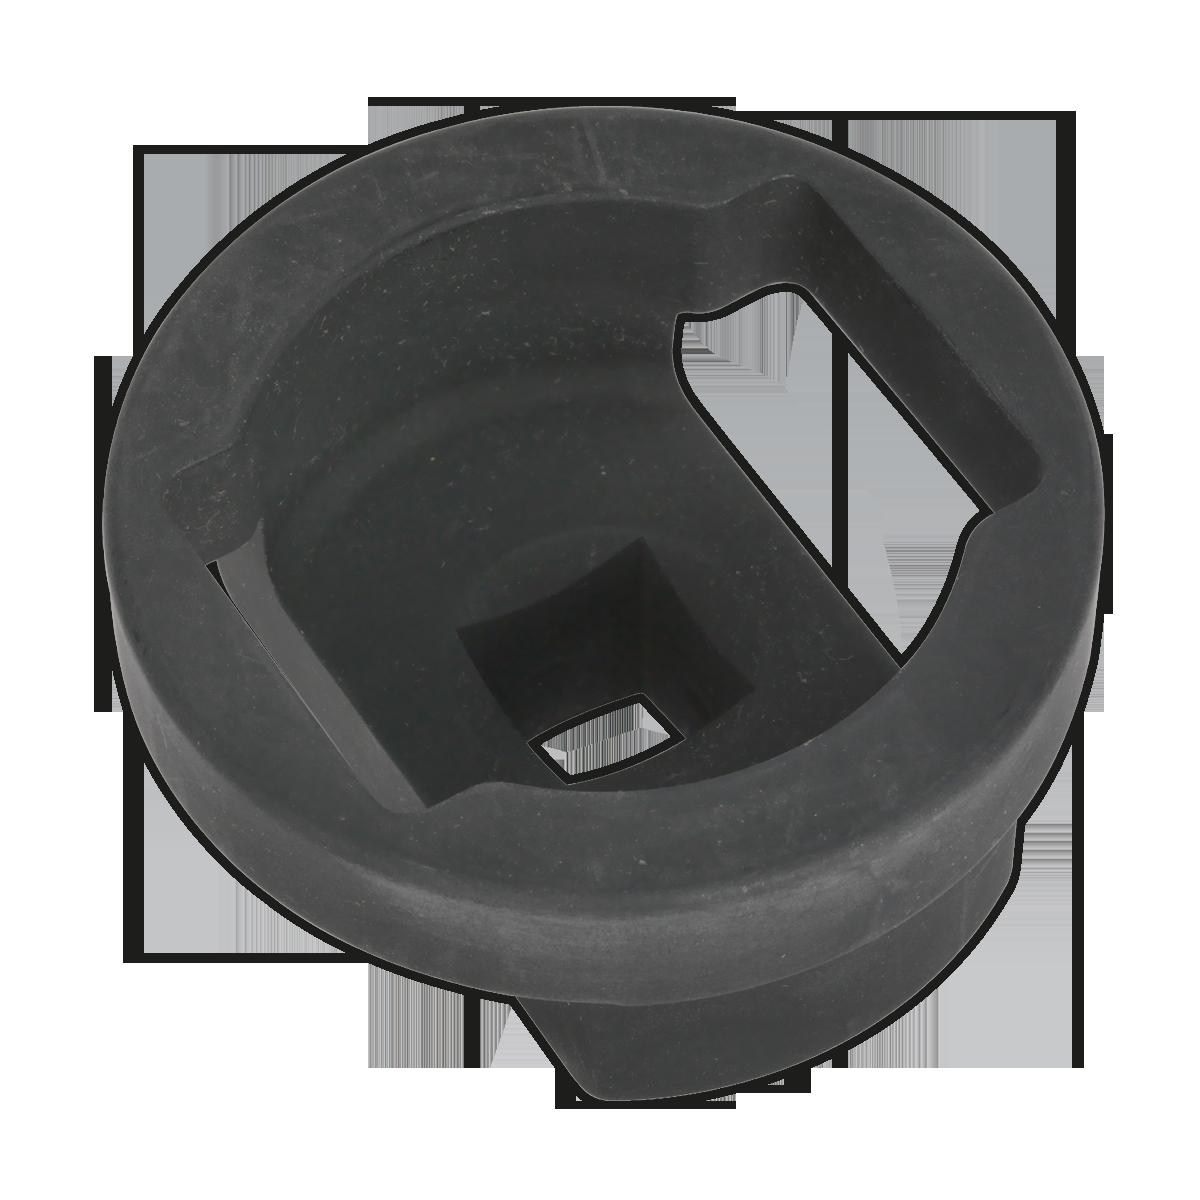 "Axle Nut Socket for BPW 6.5-9tonne Roller Bearings 3/4""Sq Drive"